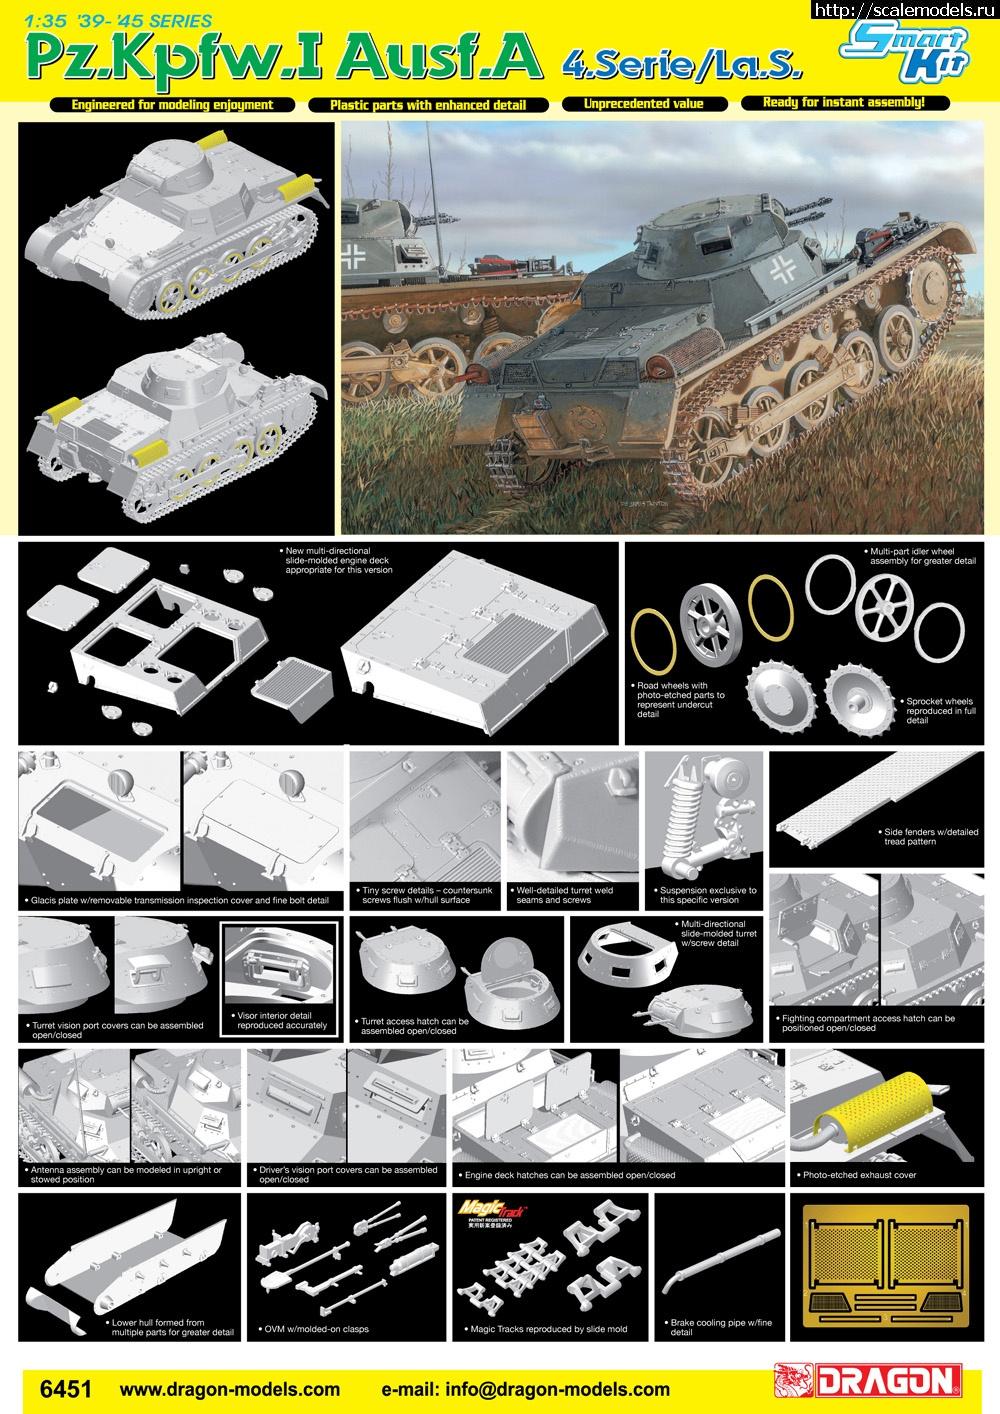 Новинка Dragon: 1/35 Pz.Kpfw.I Ausf.A 4.Serie/La.S. Закрыть окно